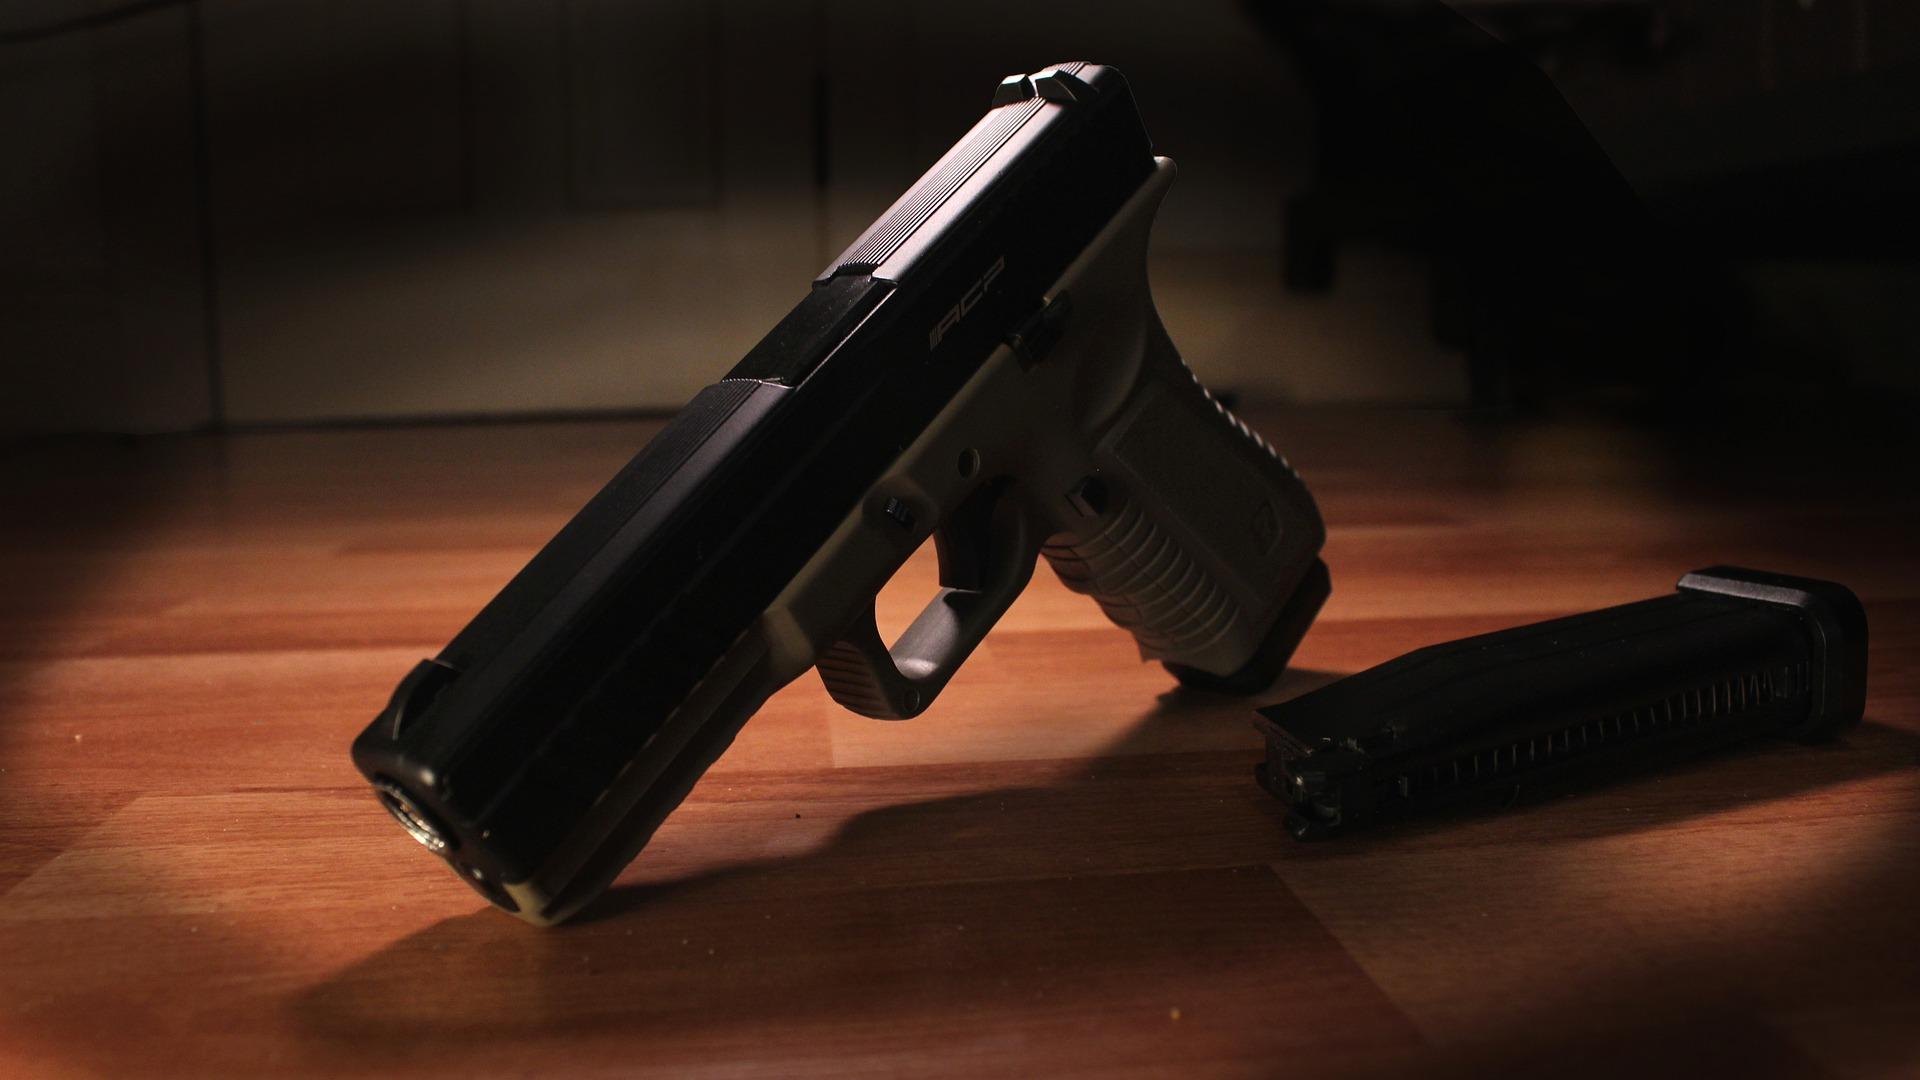 pistole na stole